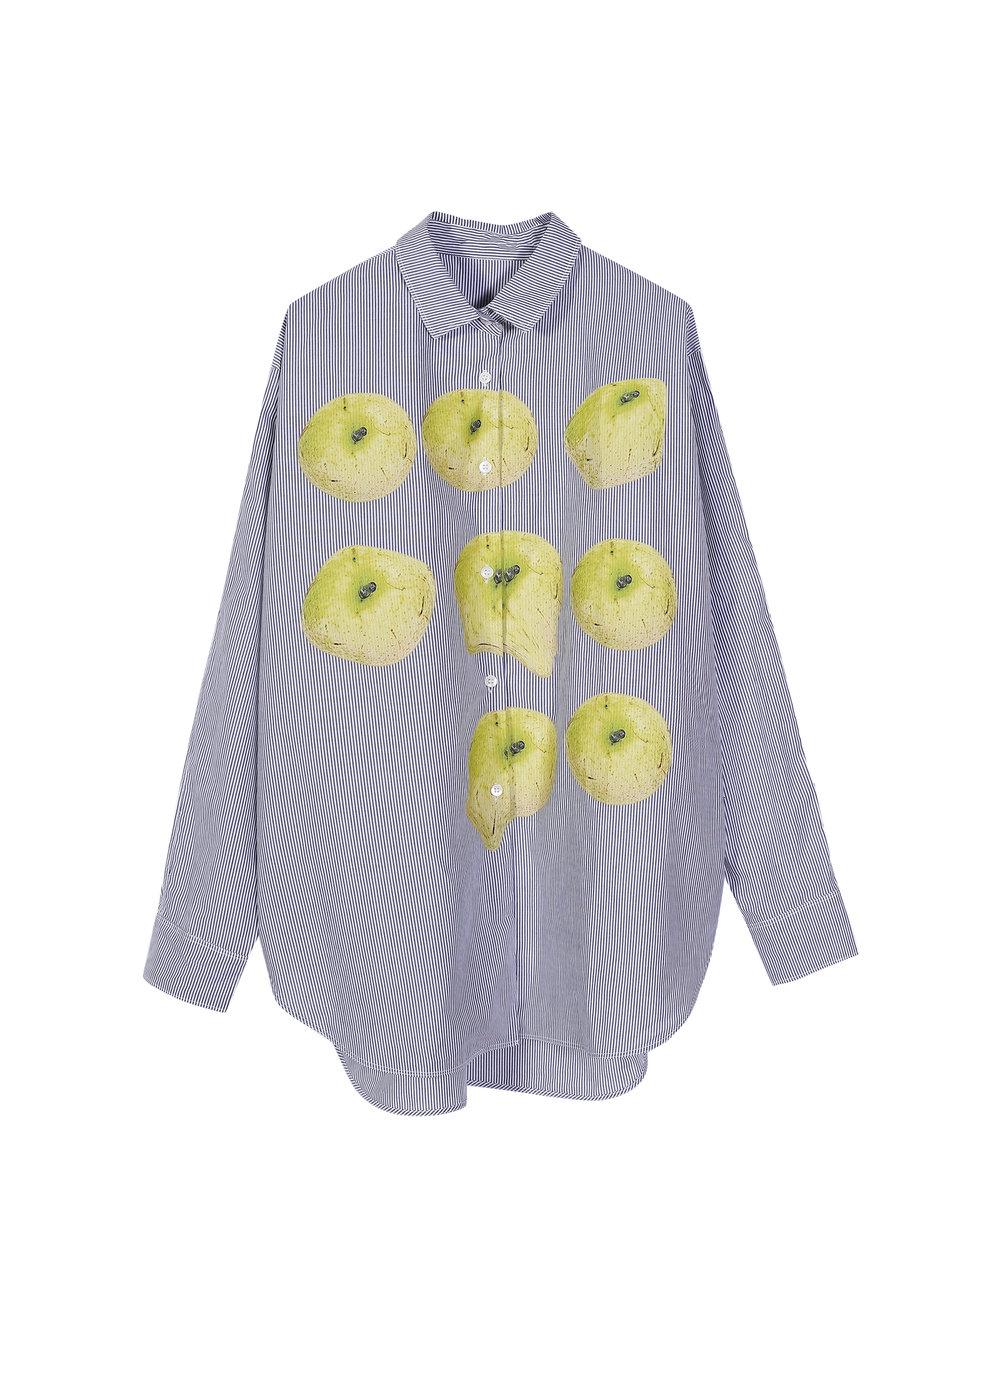 Fruit-Print Striped Cotton Shirt (5I110002)